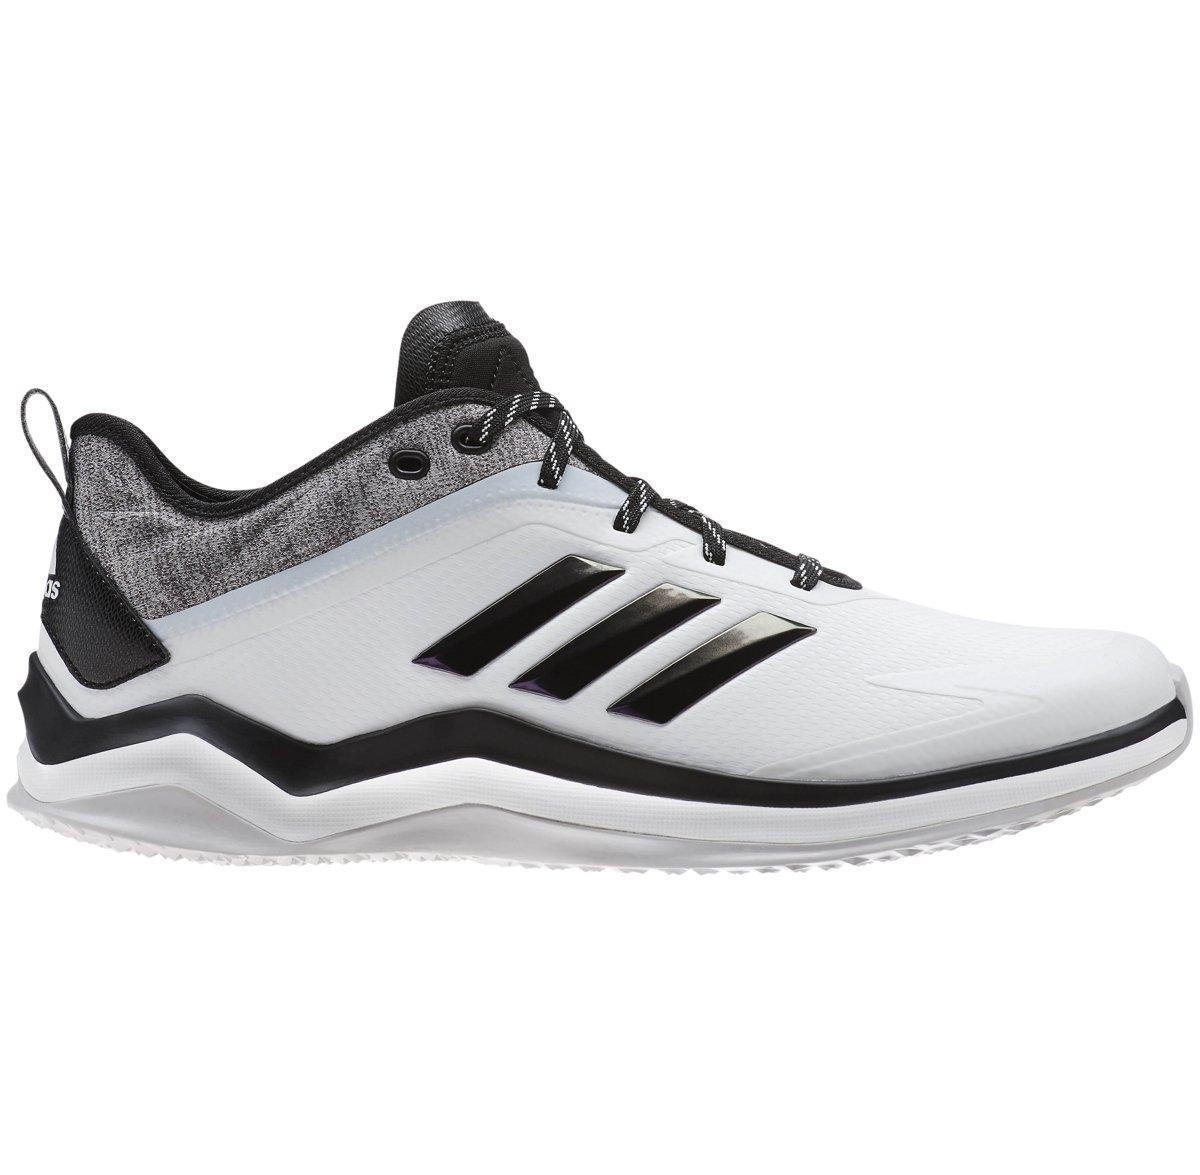 adidas Men's Speed Trainer 4 Baseball Shoe B077X4RCNF 4.5 D(M) US|Crystal White/Black/Carbon 1765